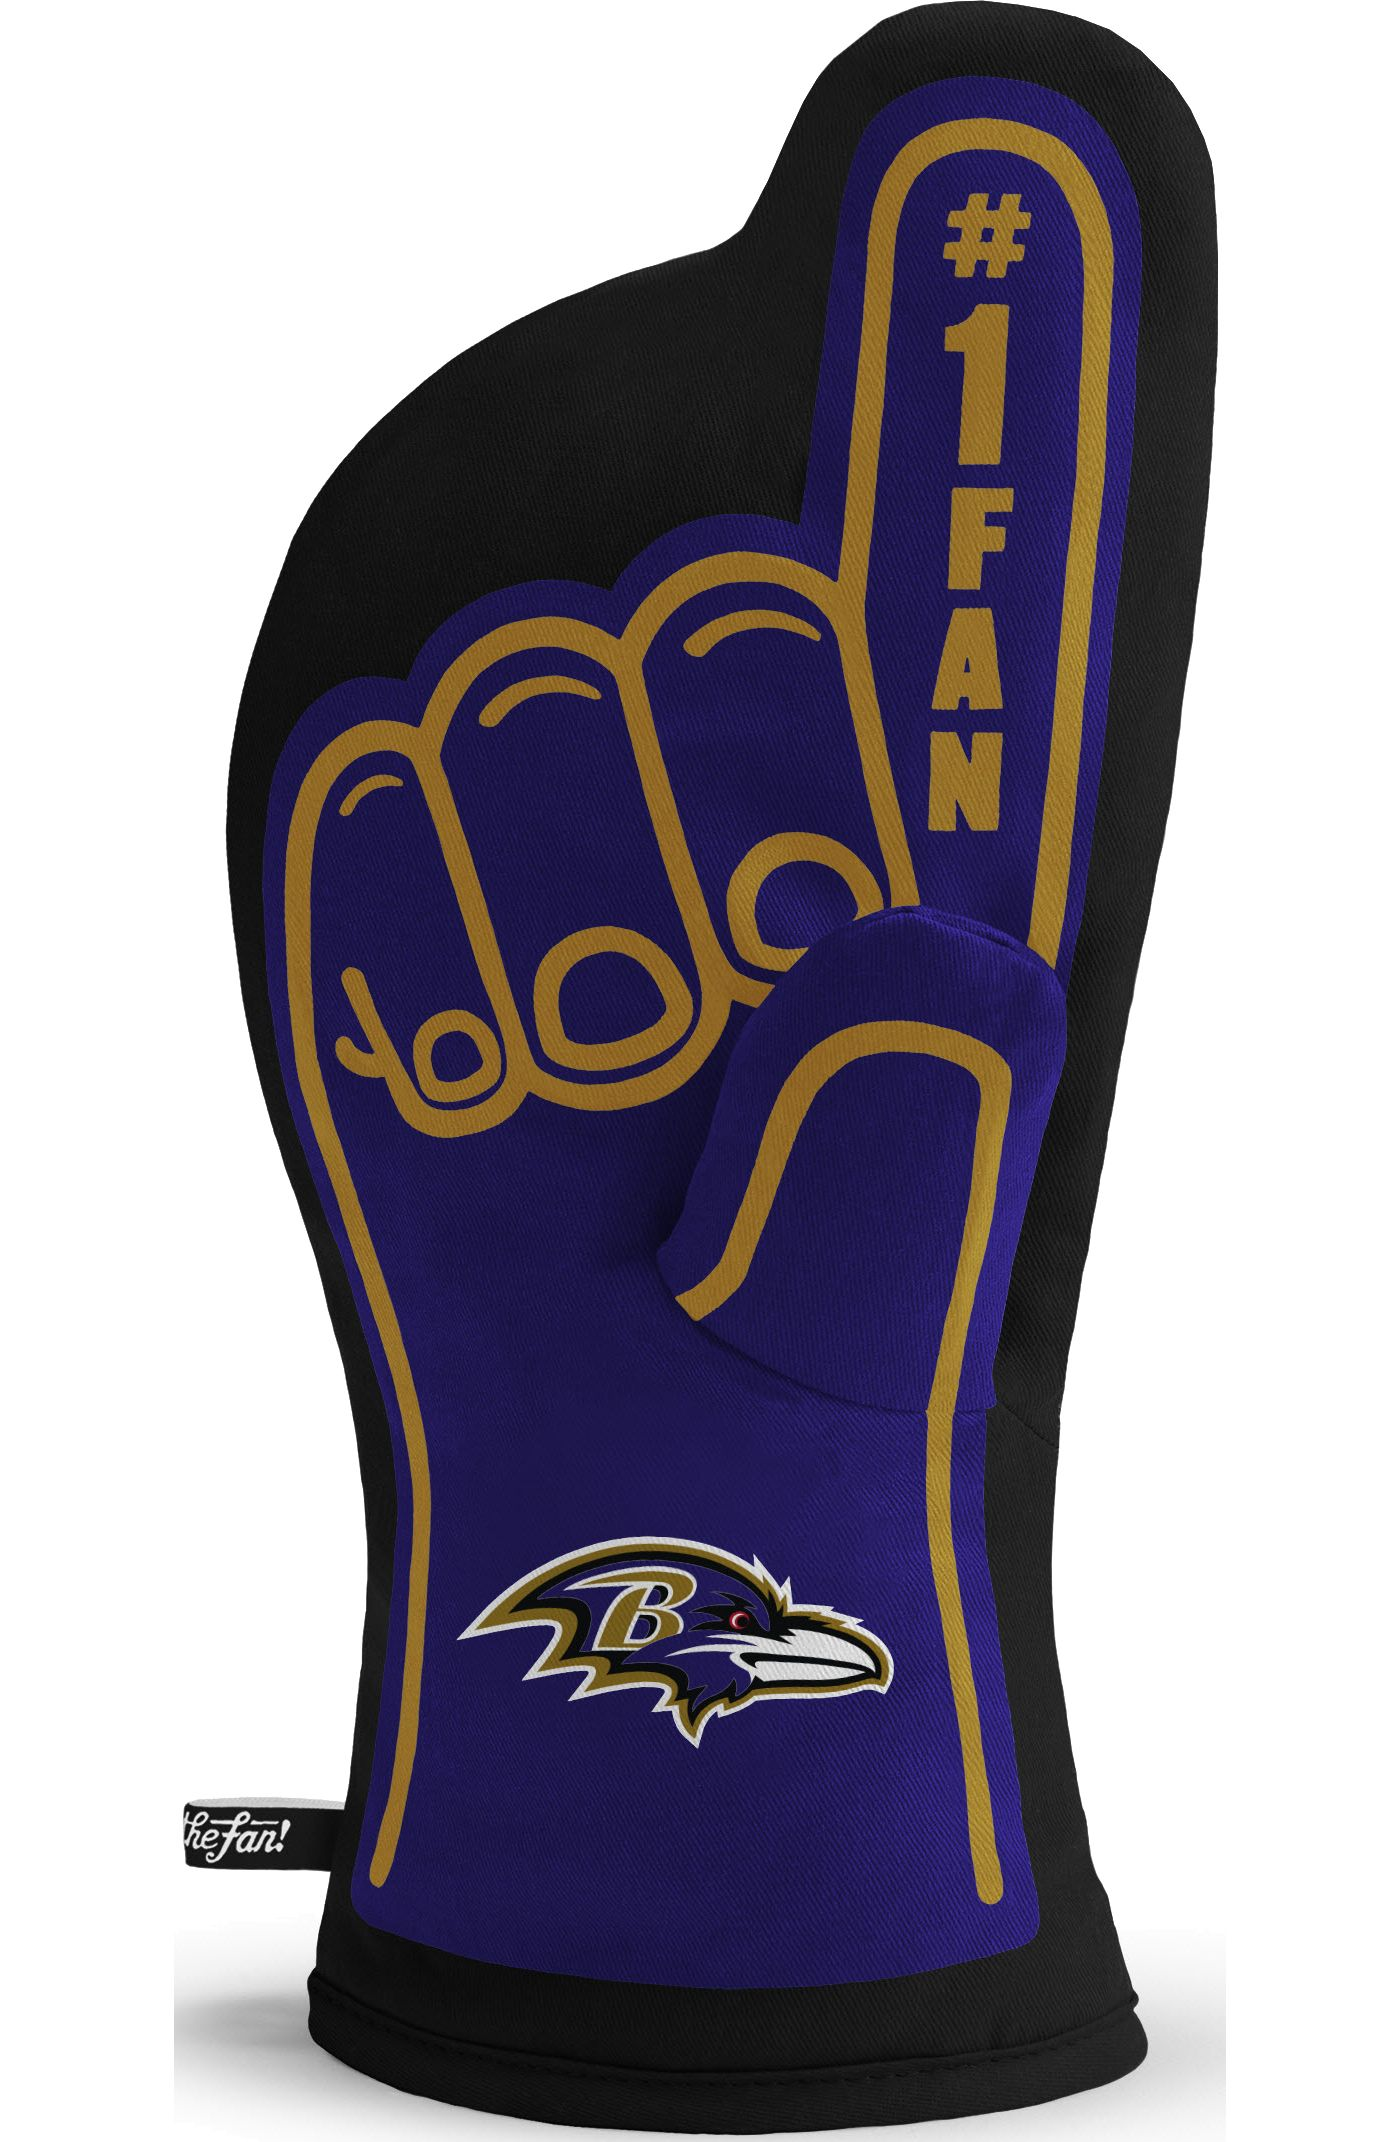 You The Fan Baltimore Ravens #1 Oven Mitt